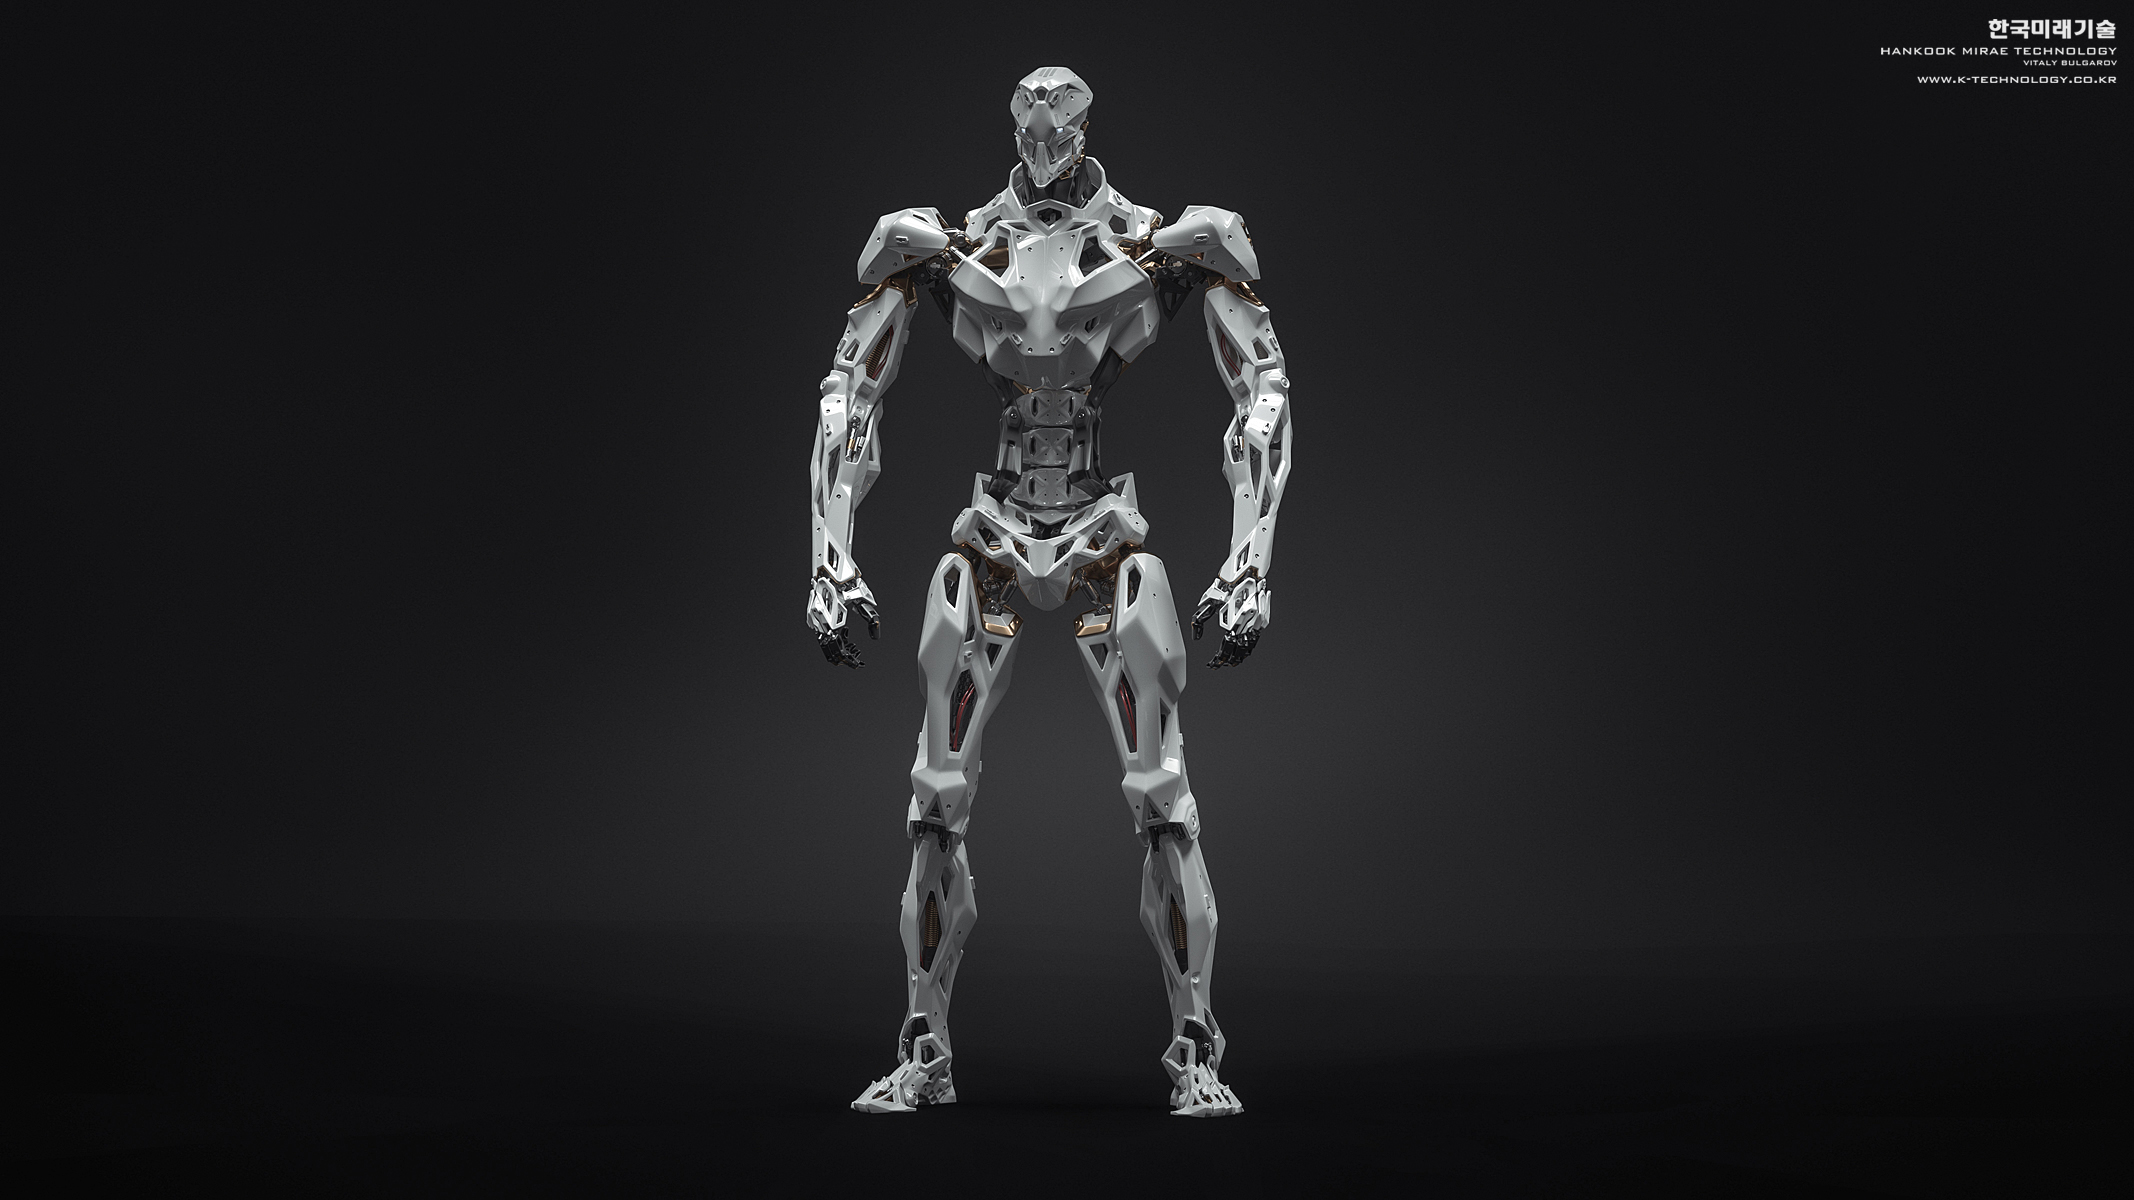 KFT_2.Xm_RobotDesign_ (16 of 29).jpg